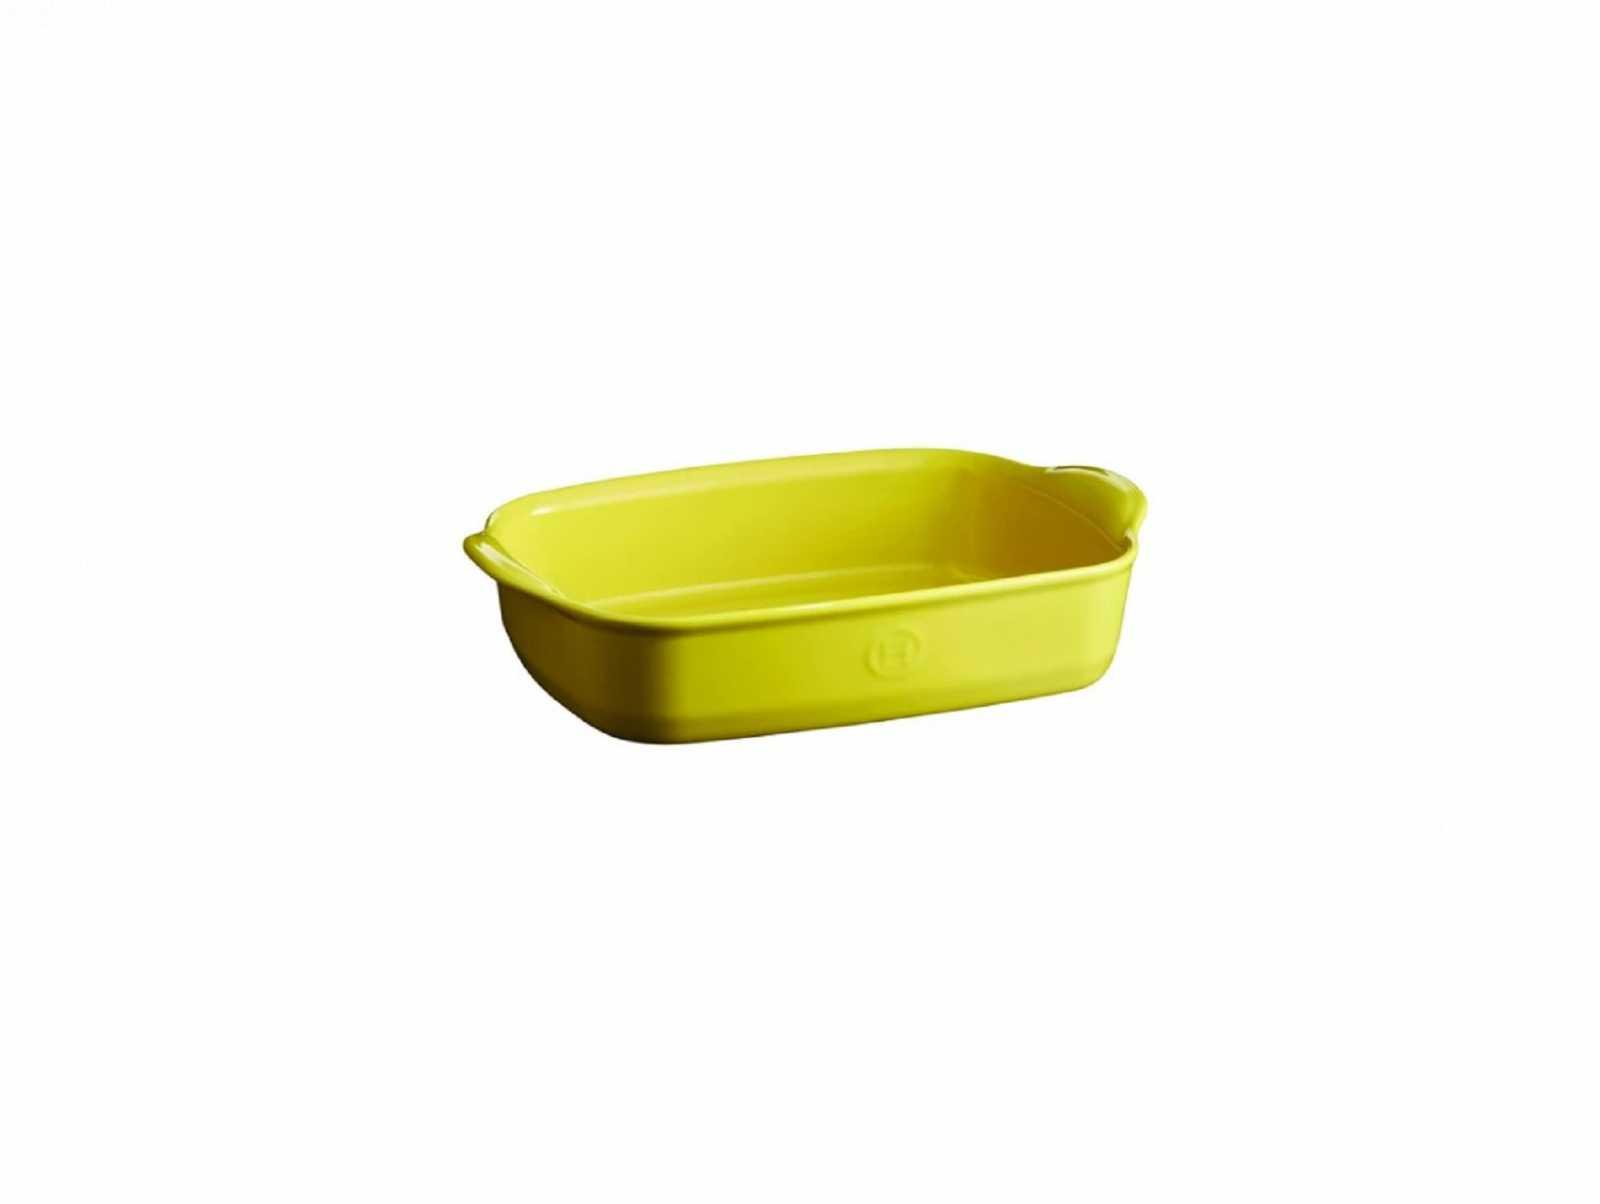 Онлайн каталог PROMENU: Форма для запекания Emile Henry OVENWARE, 30х19 см, желтый                               909650